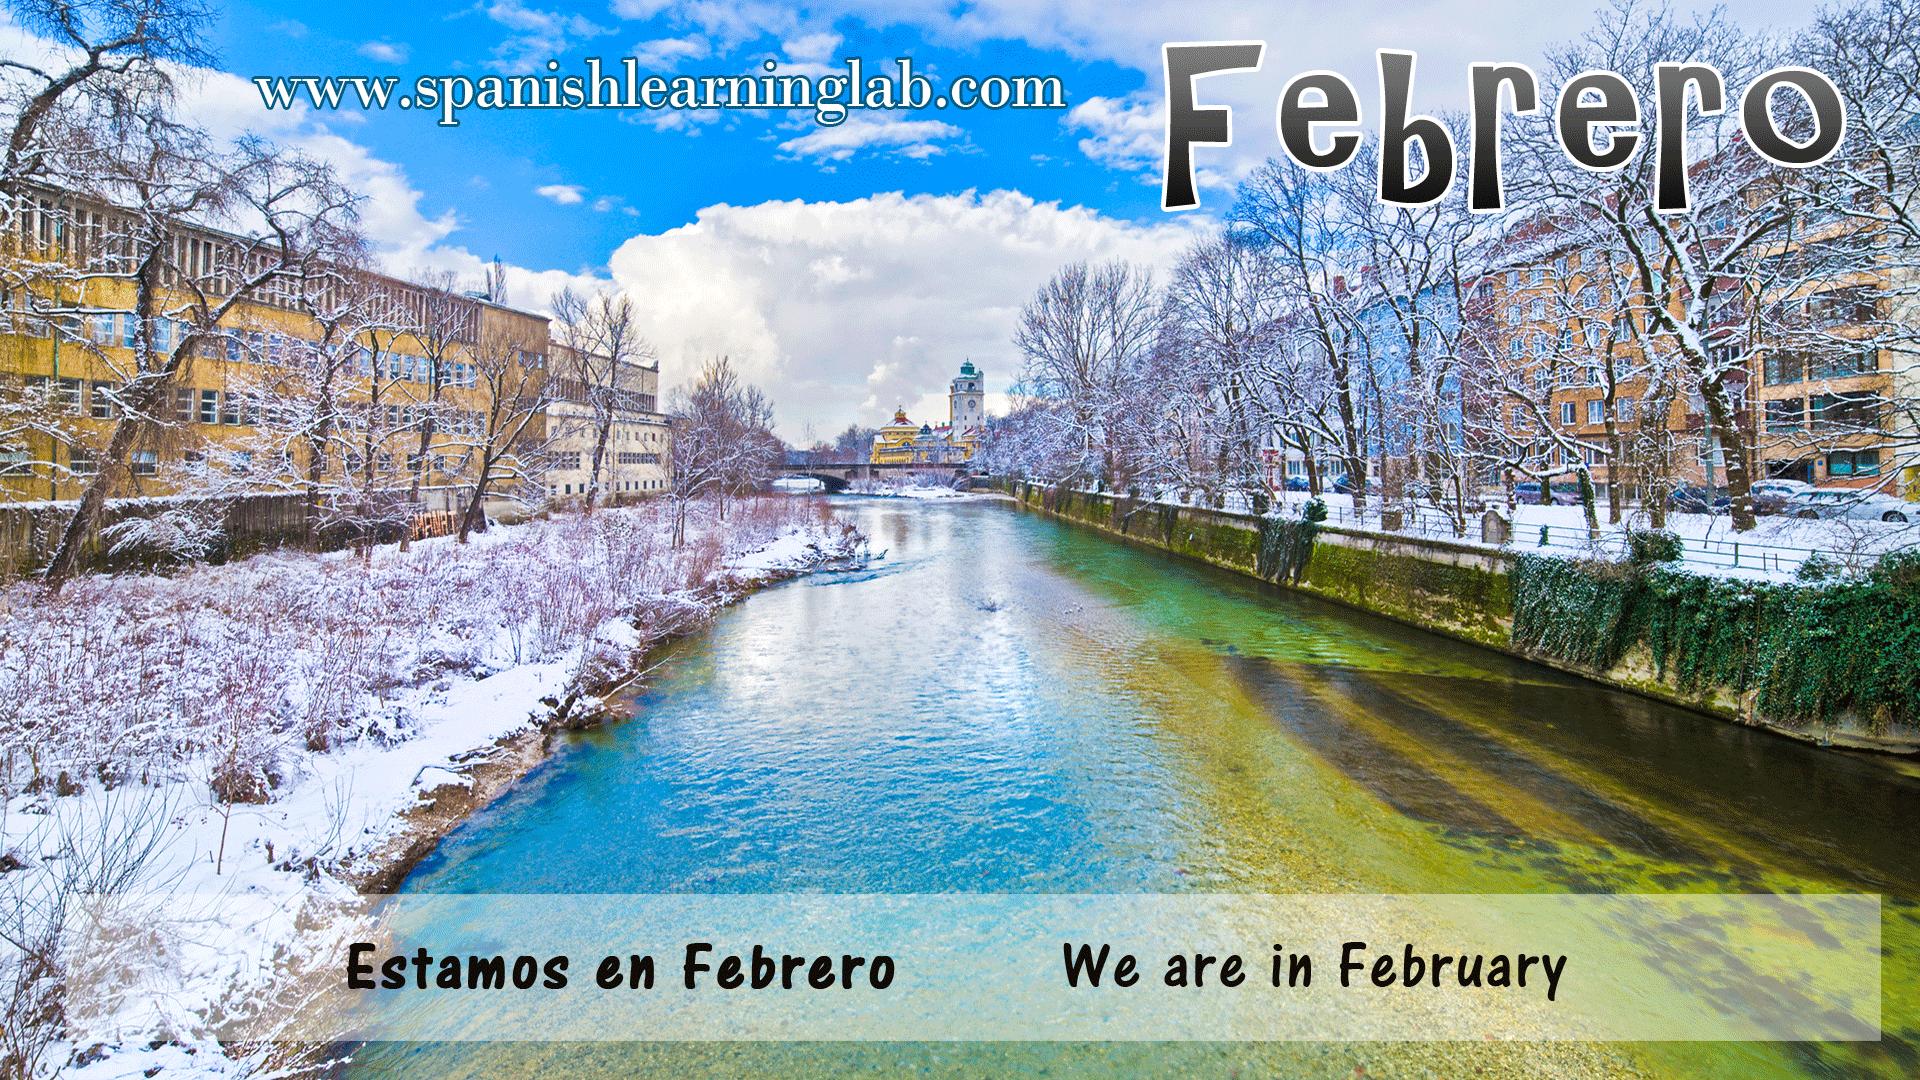 Febrero es el segundo mes del año http://www.spanishlearninglab.com/spanish-months-of-the-year/